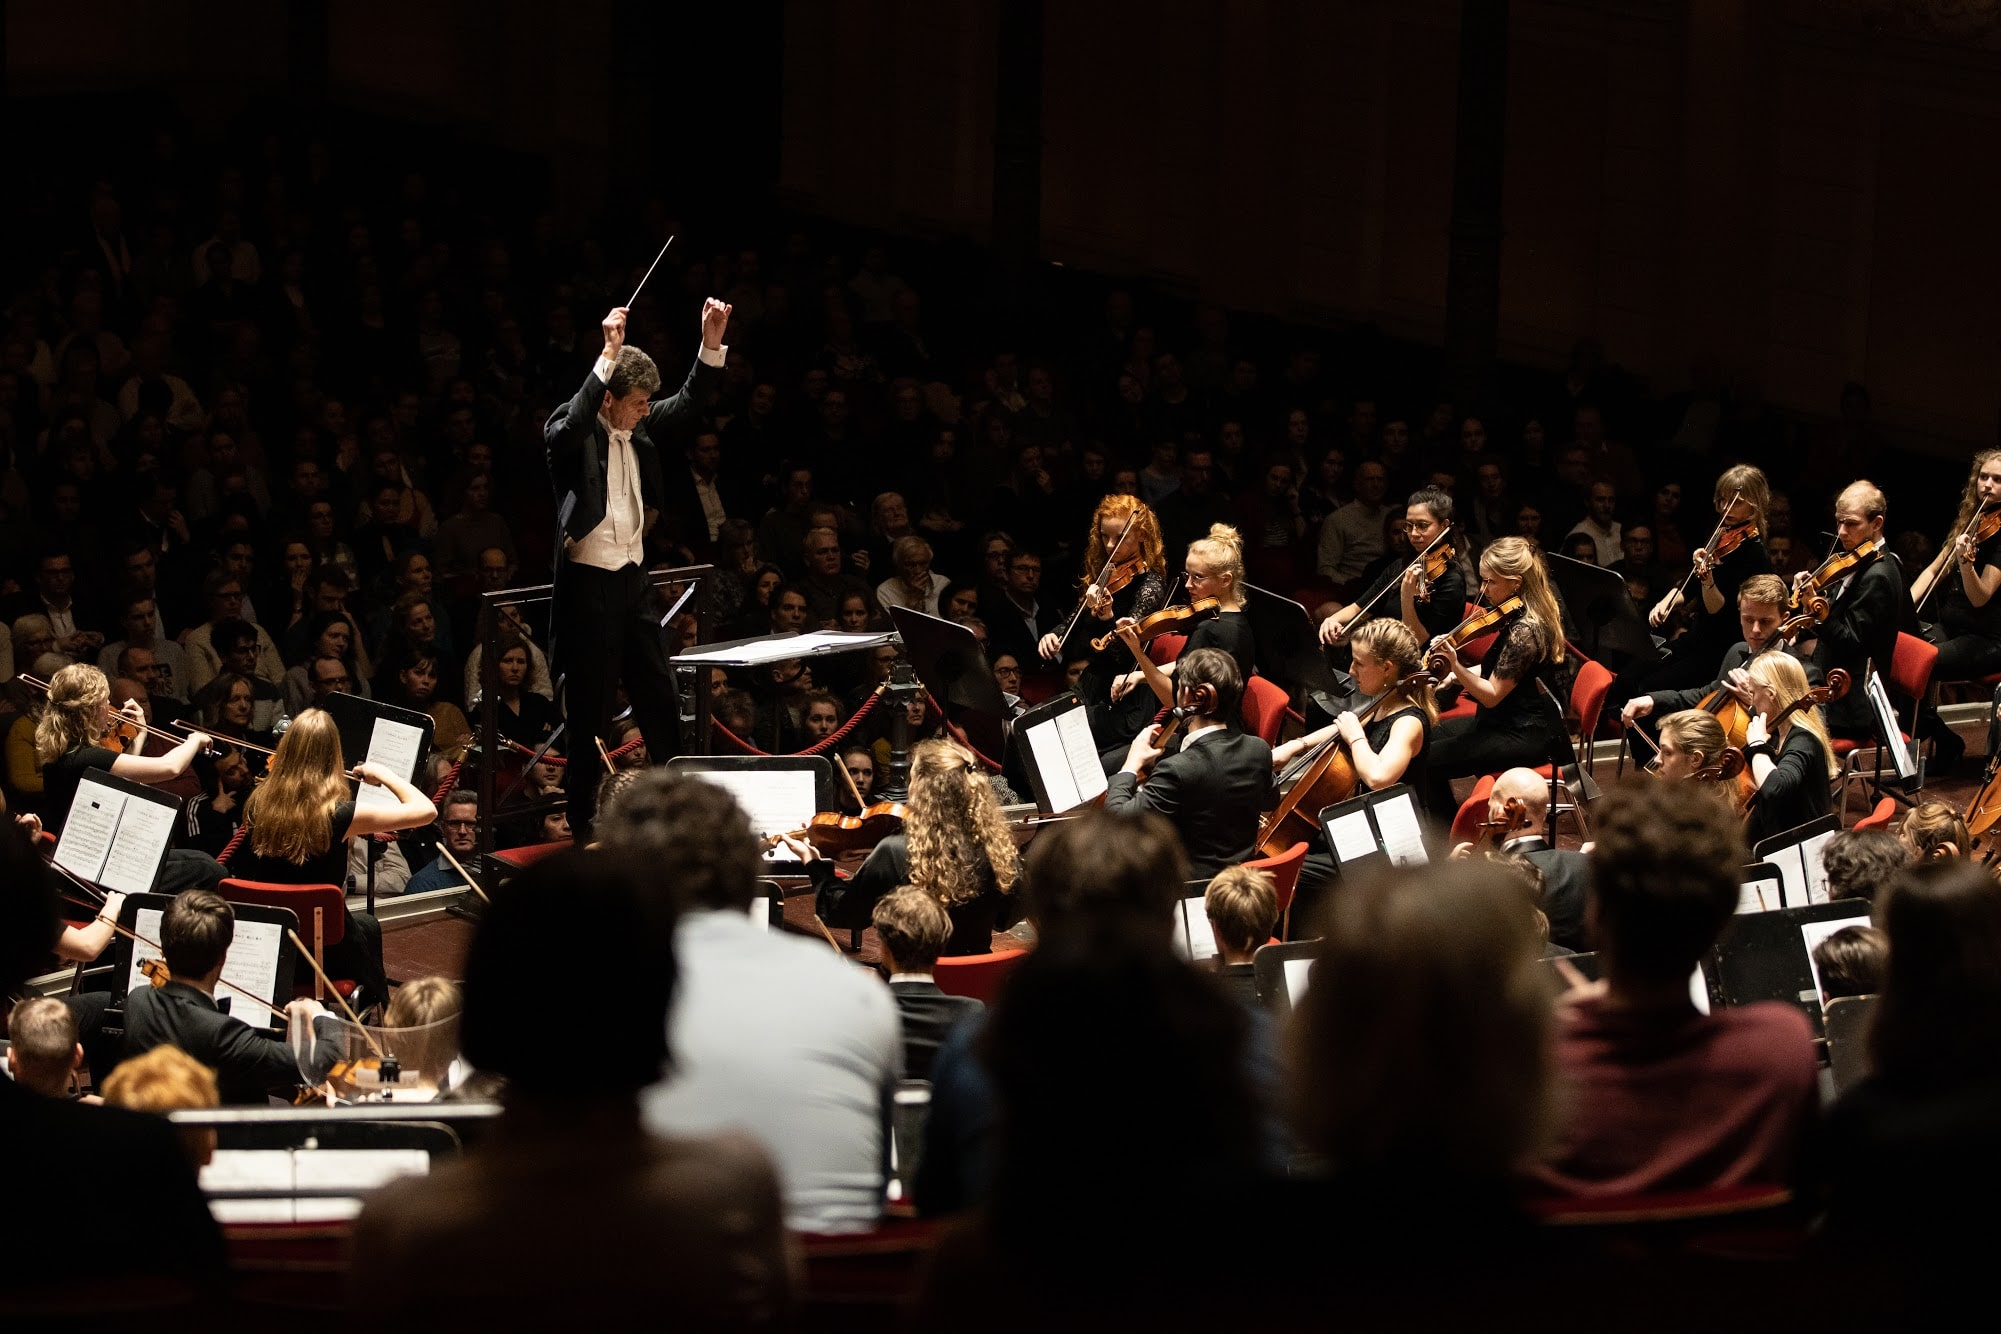 VU-orkest o.l.v. René Gulikers